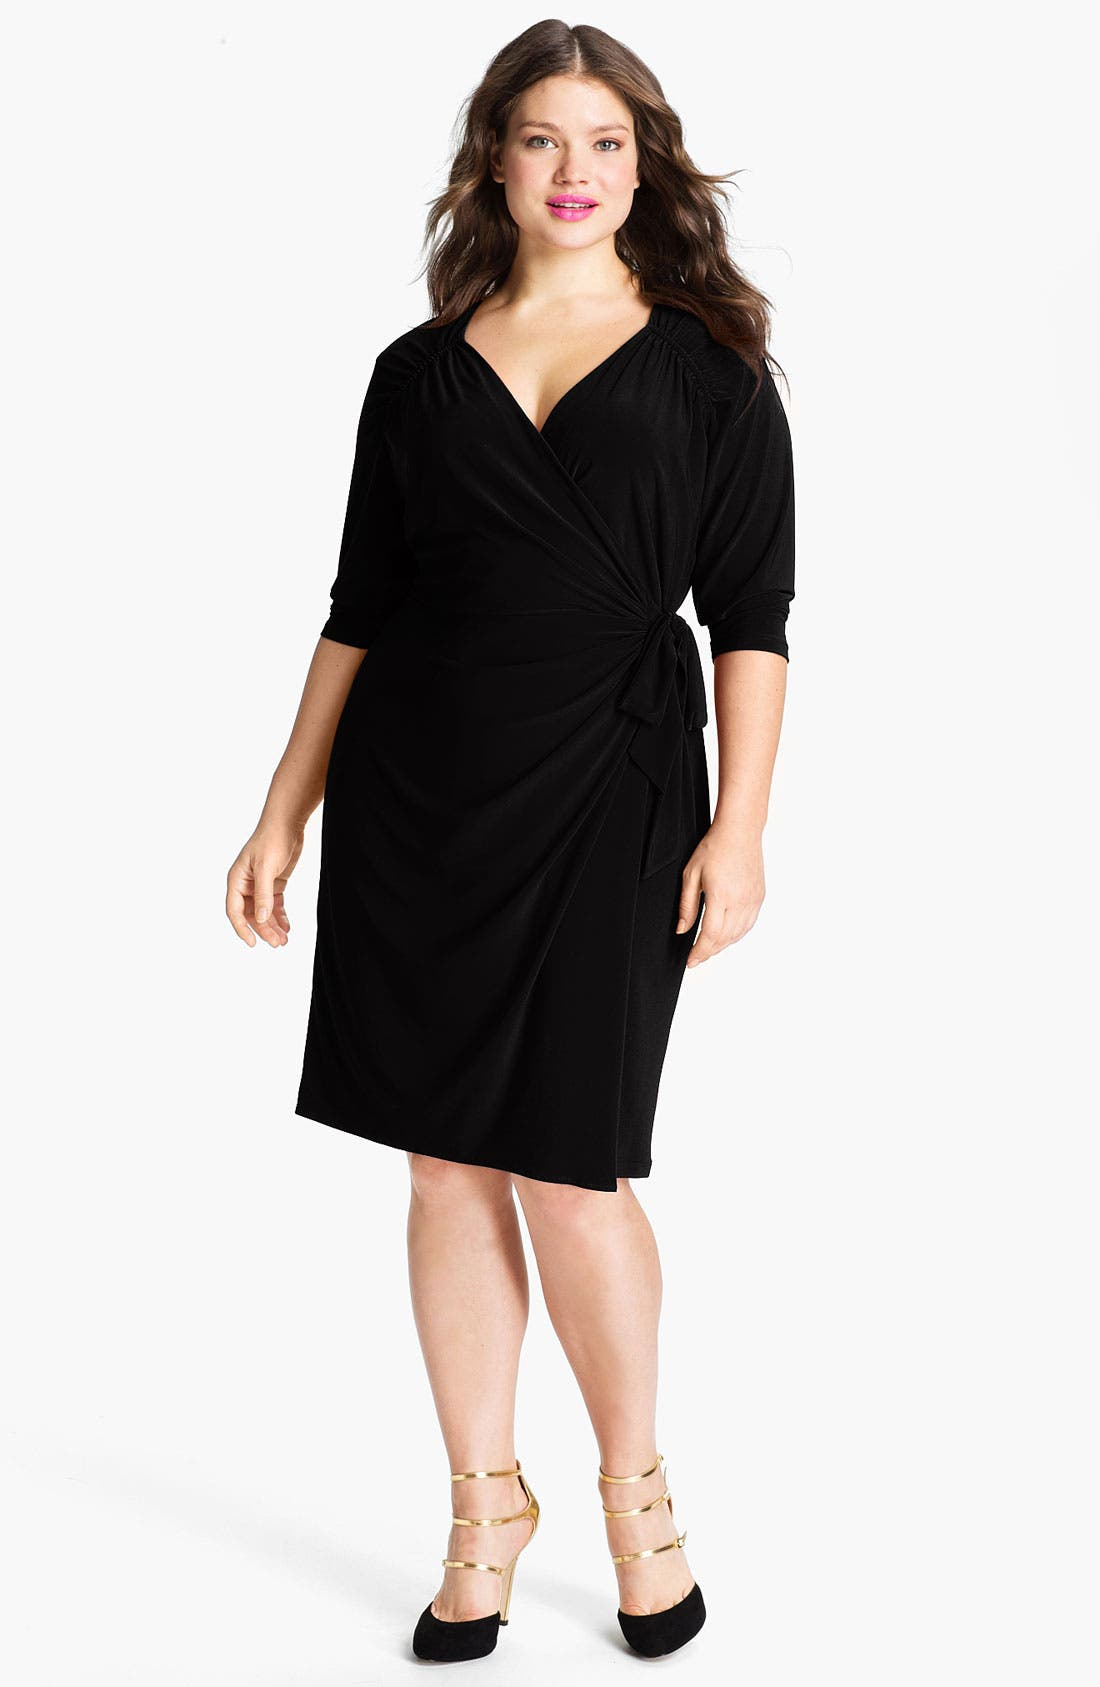 Main Image - Suzi Chin for Maggy Boutique Jersey Faux Wrap Dress (Plus)